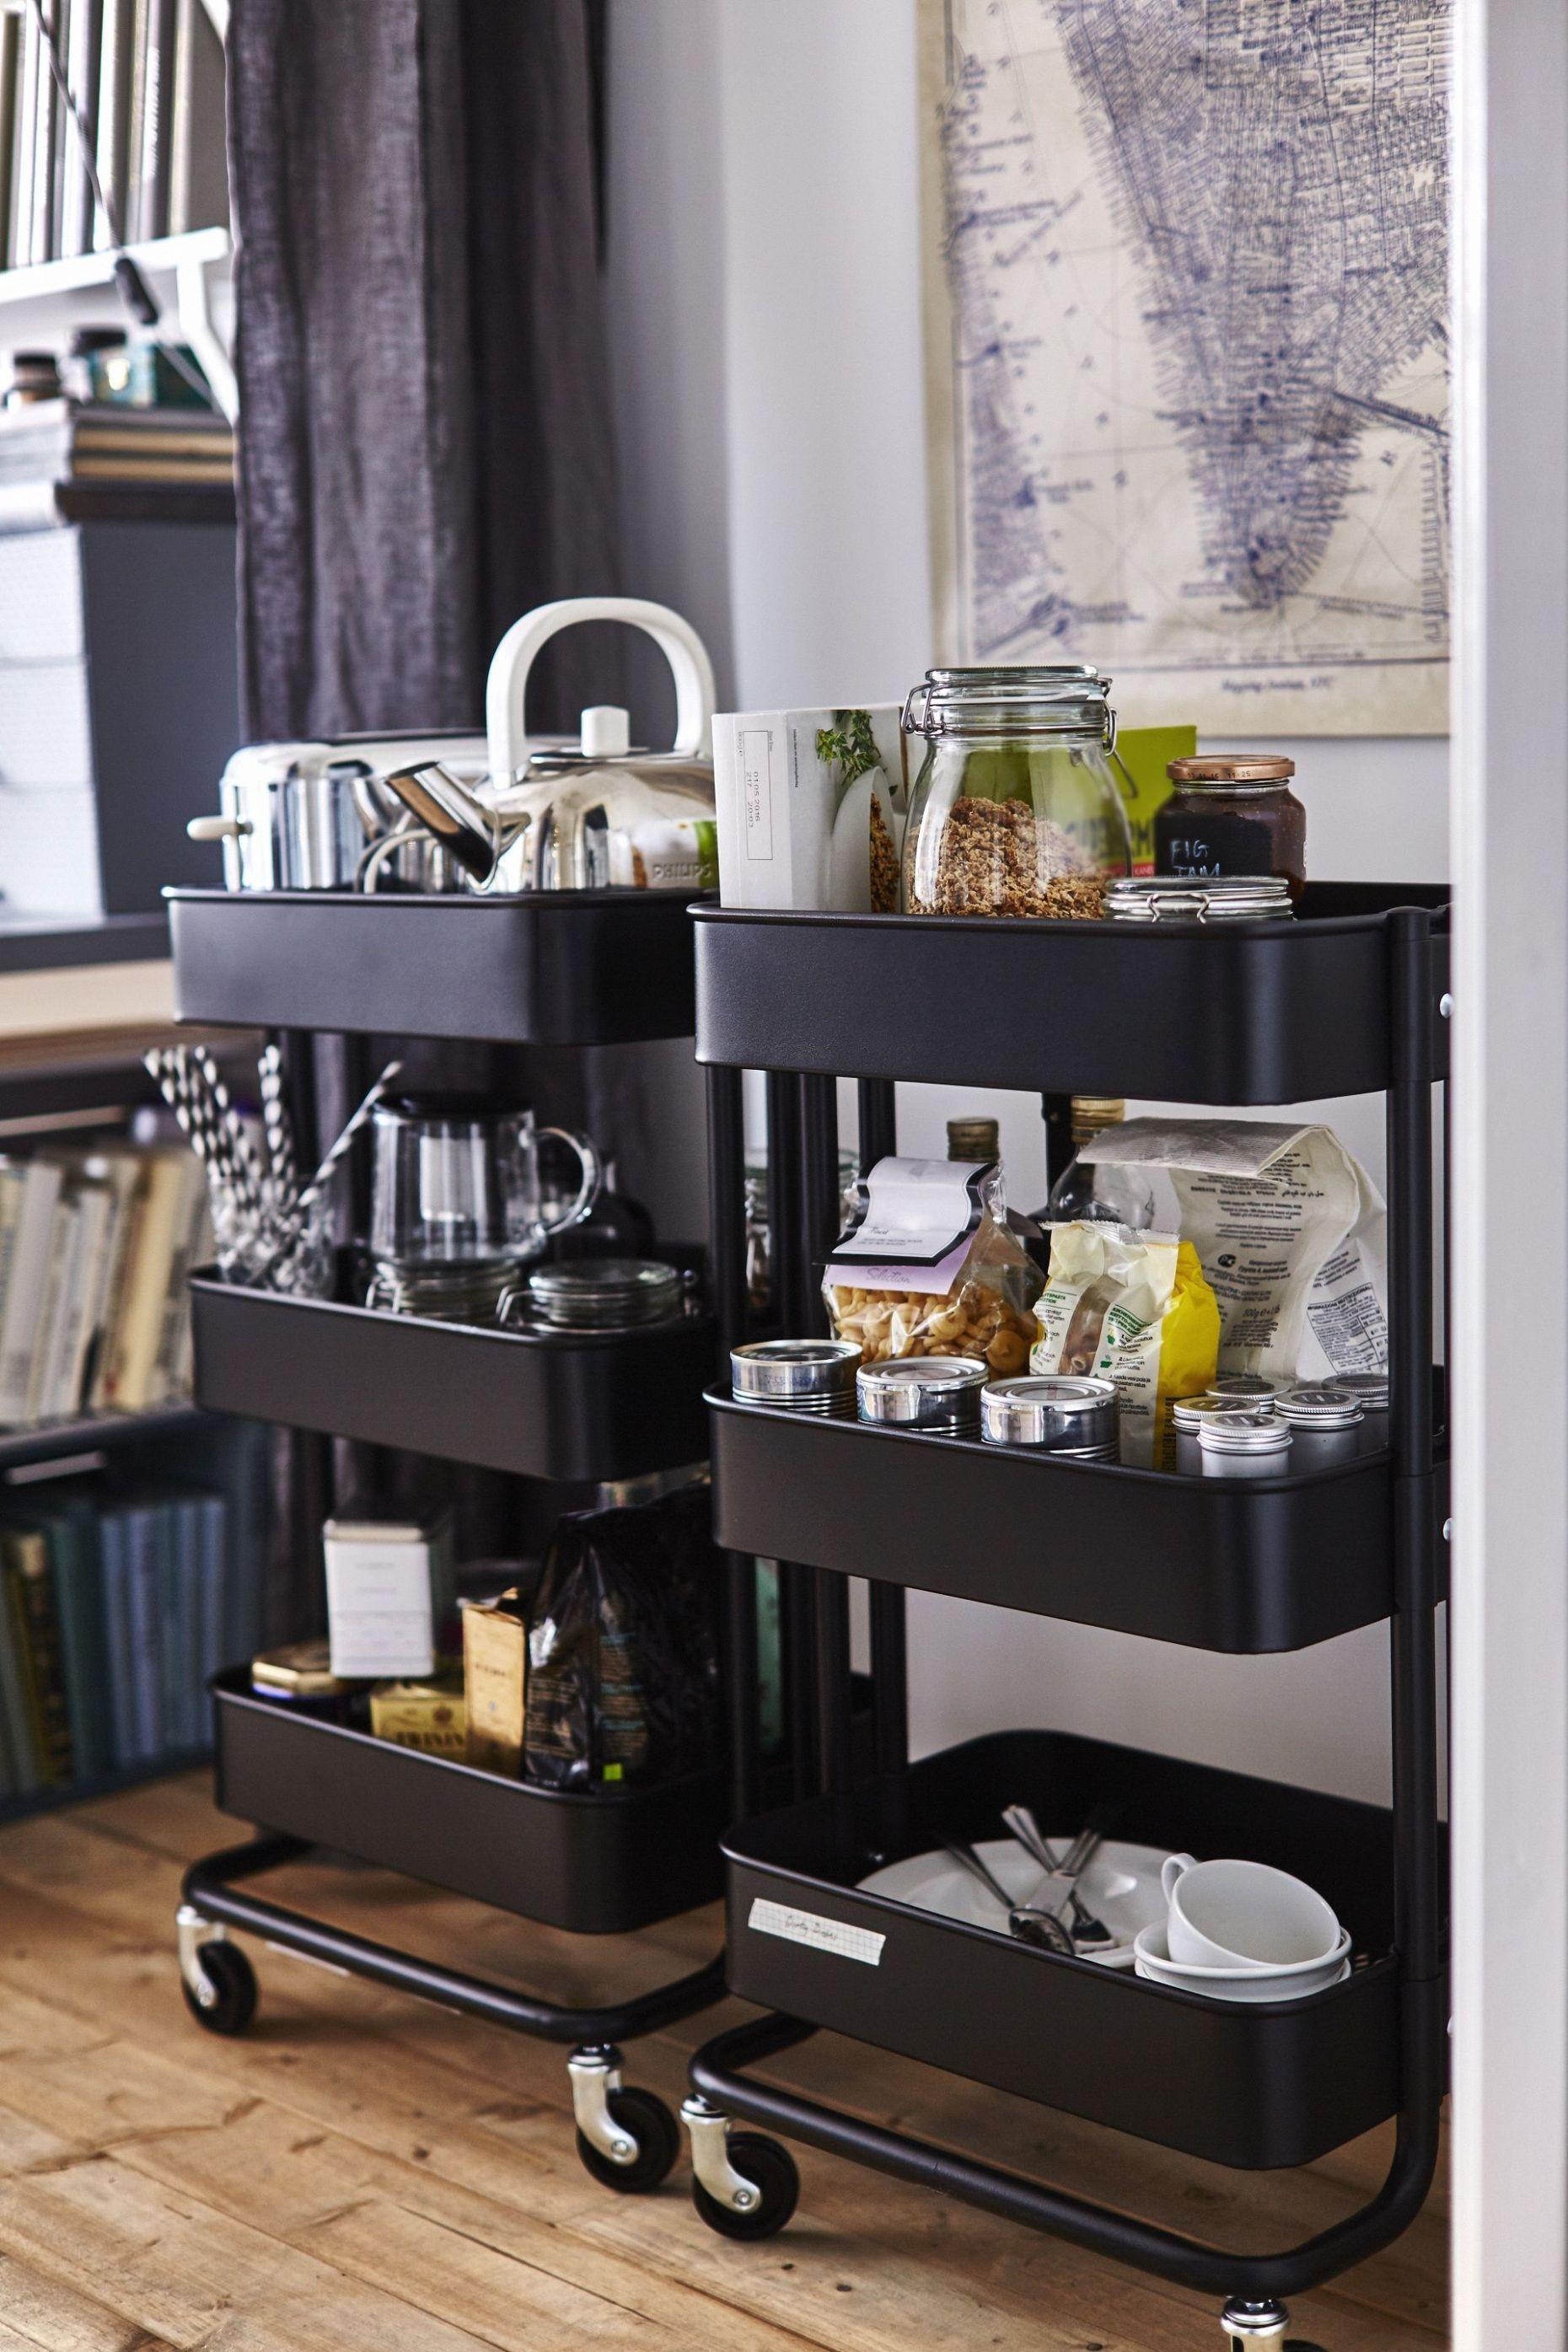 Ikea Dorm Room Ideas: Creative Uses For Rolling Carts